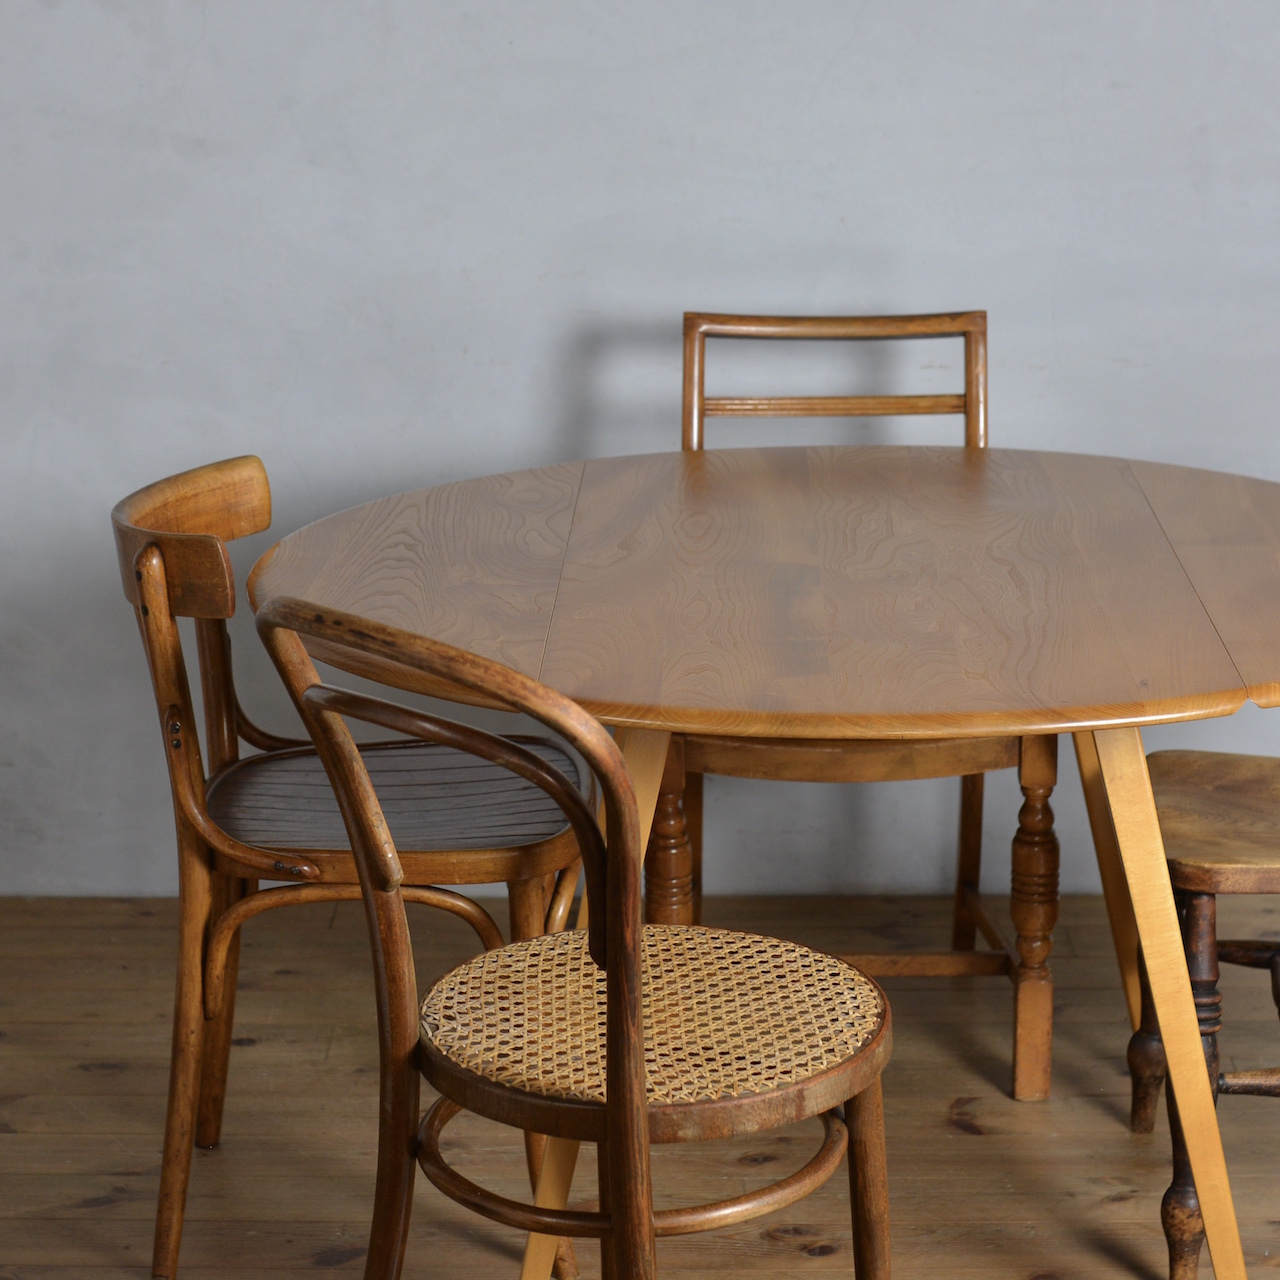 Ercol Oval Drop Leaf Table / アーコール ドロップ リーフ テーブル 〈ダイニング・伸張式・円卓・北欧〉 SB2010-0004